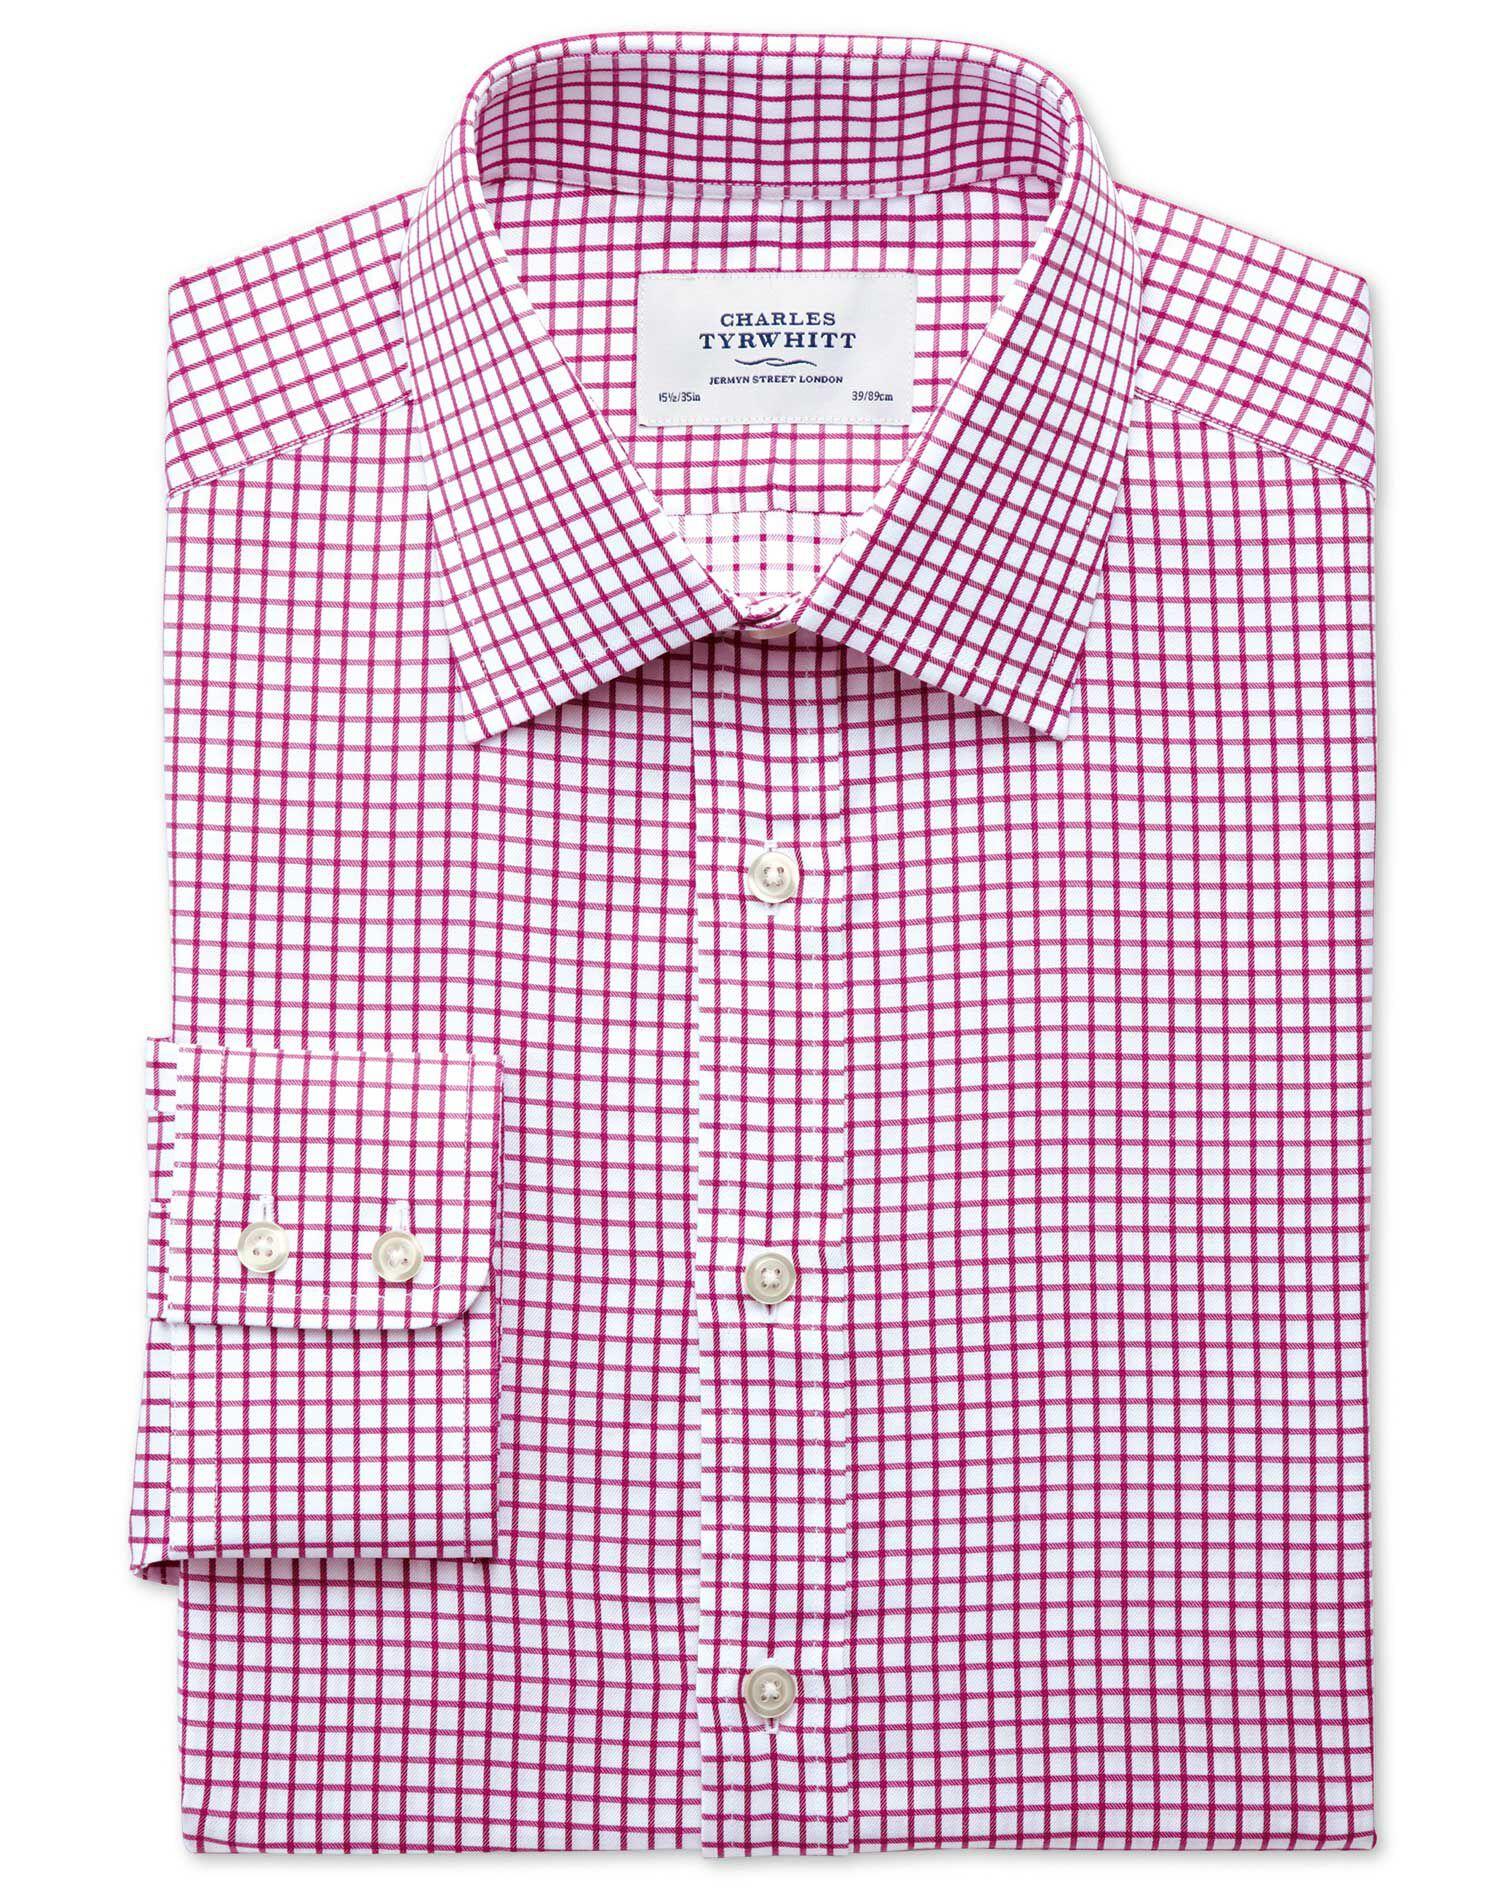 Slim Fit Twill Grid Check Fuchsia Cotton Formal Shirt Single Cuff Size 16.5/34 by Charles Tyrwhitt